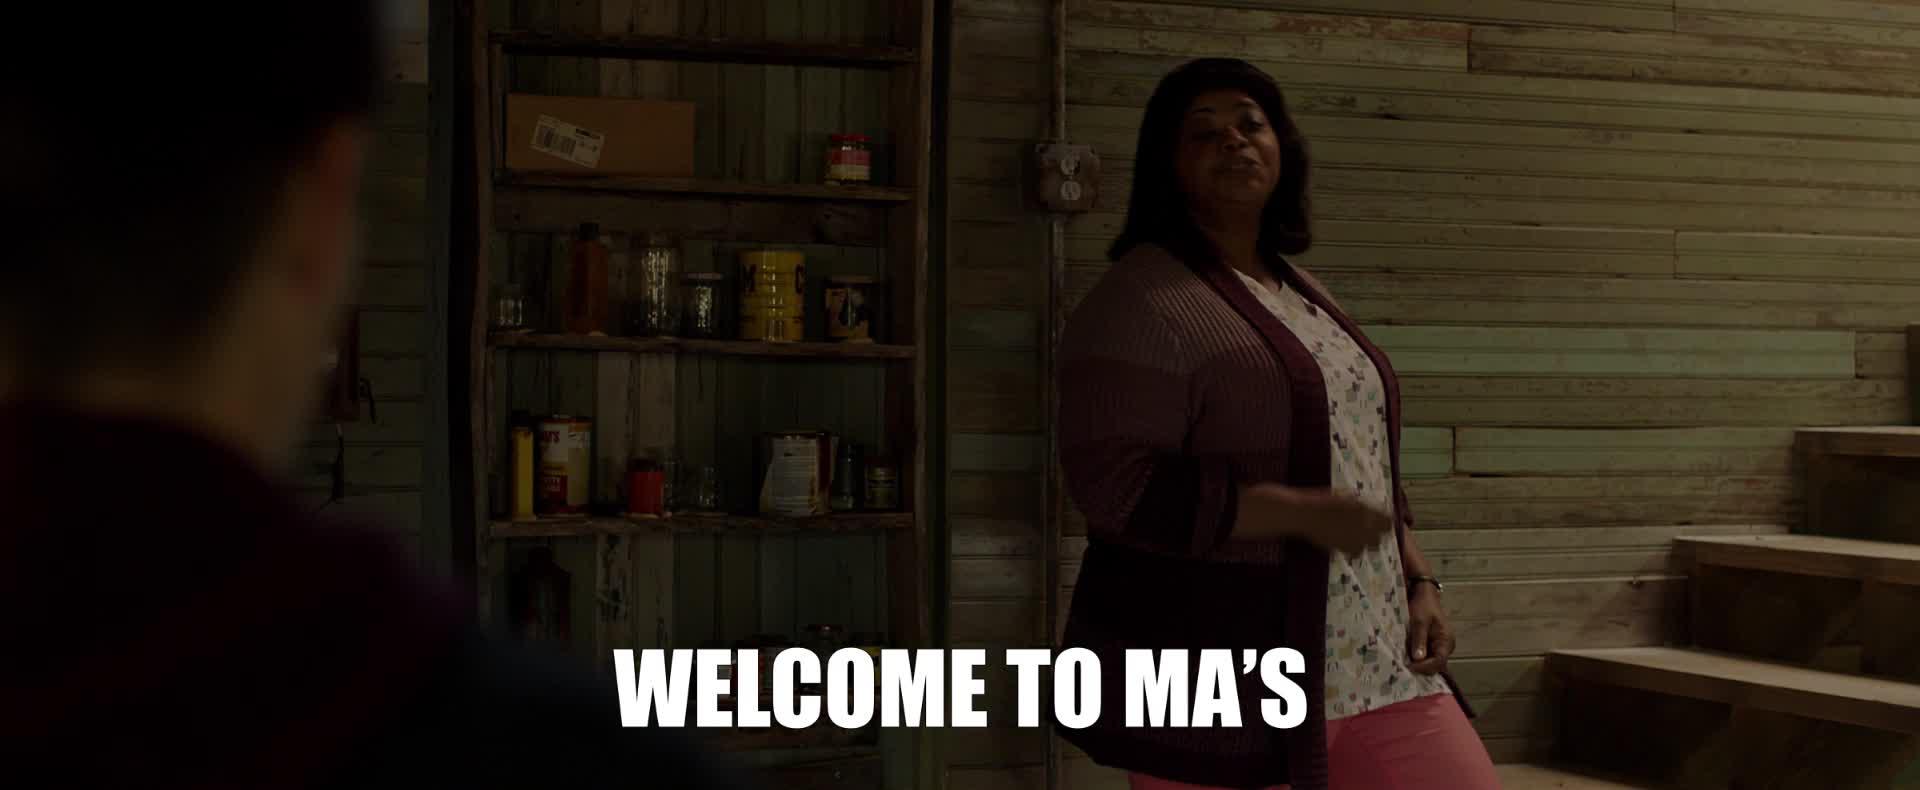 ma, ma movie, mothers day, octavia spencer, Welcome To MA's GIFs